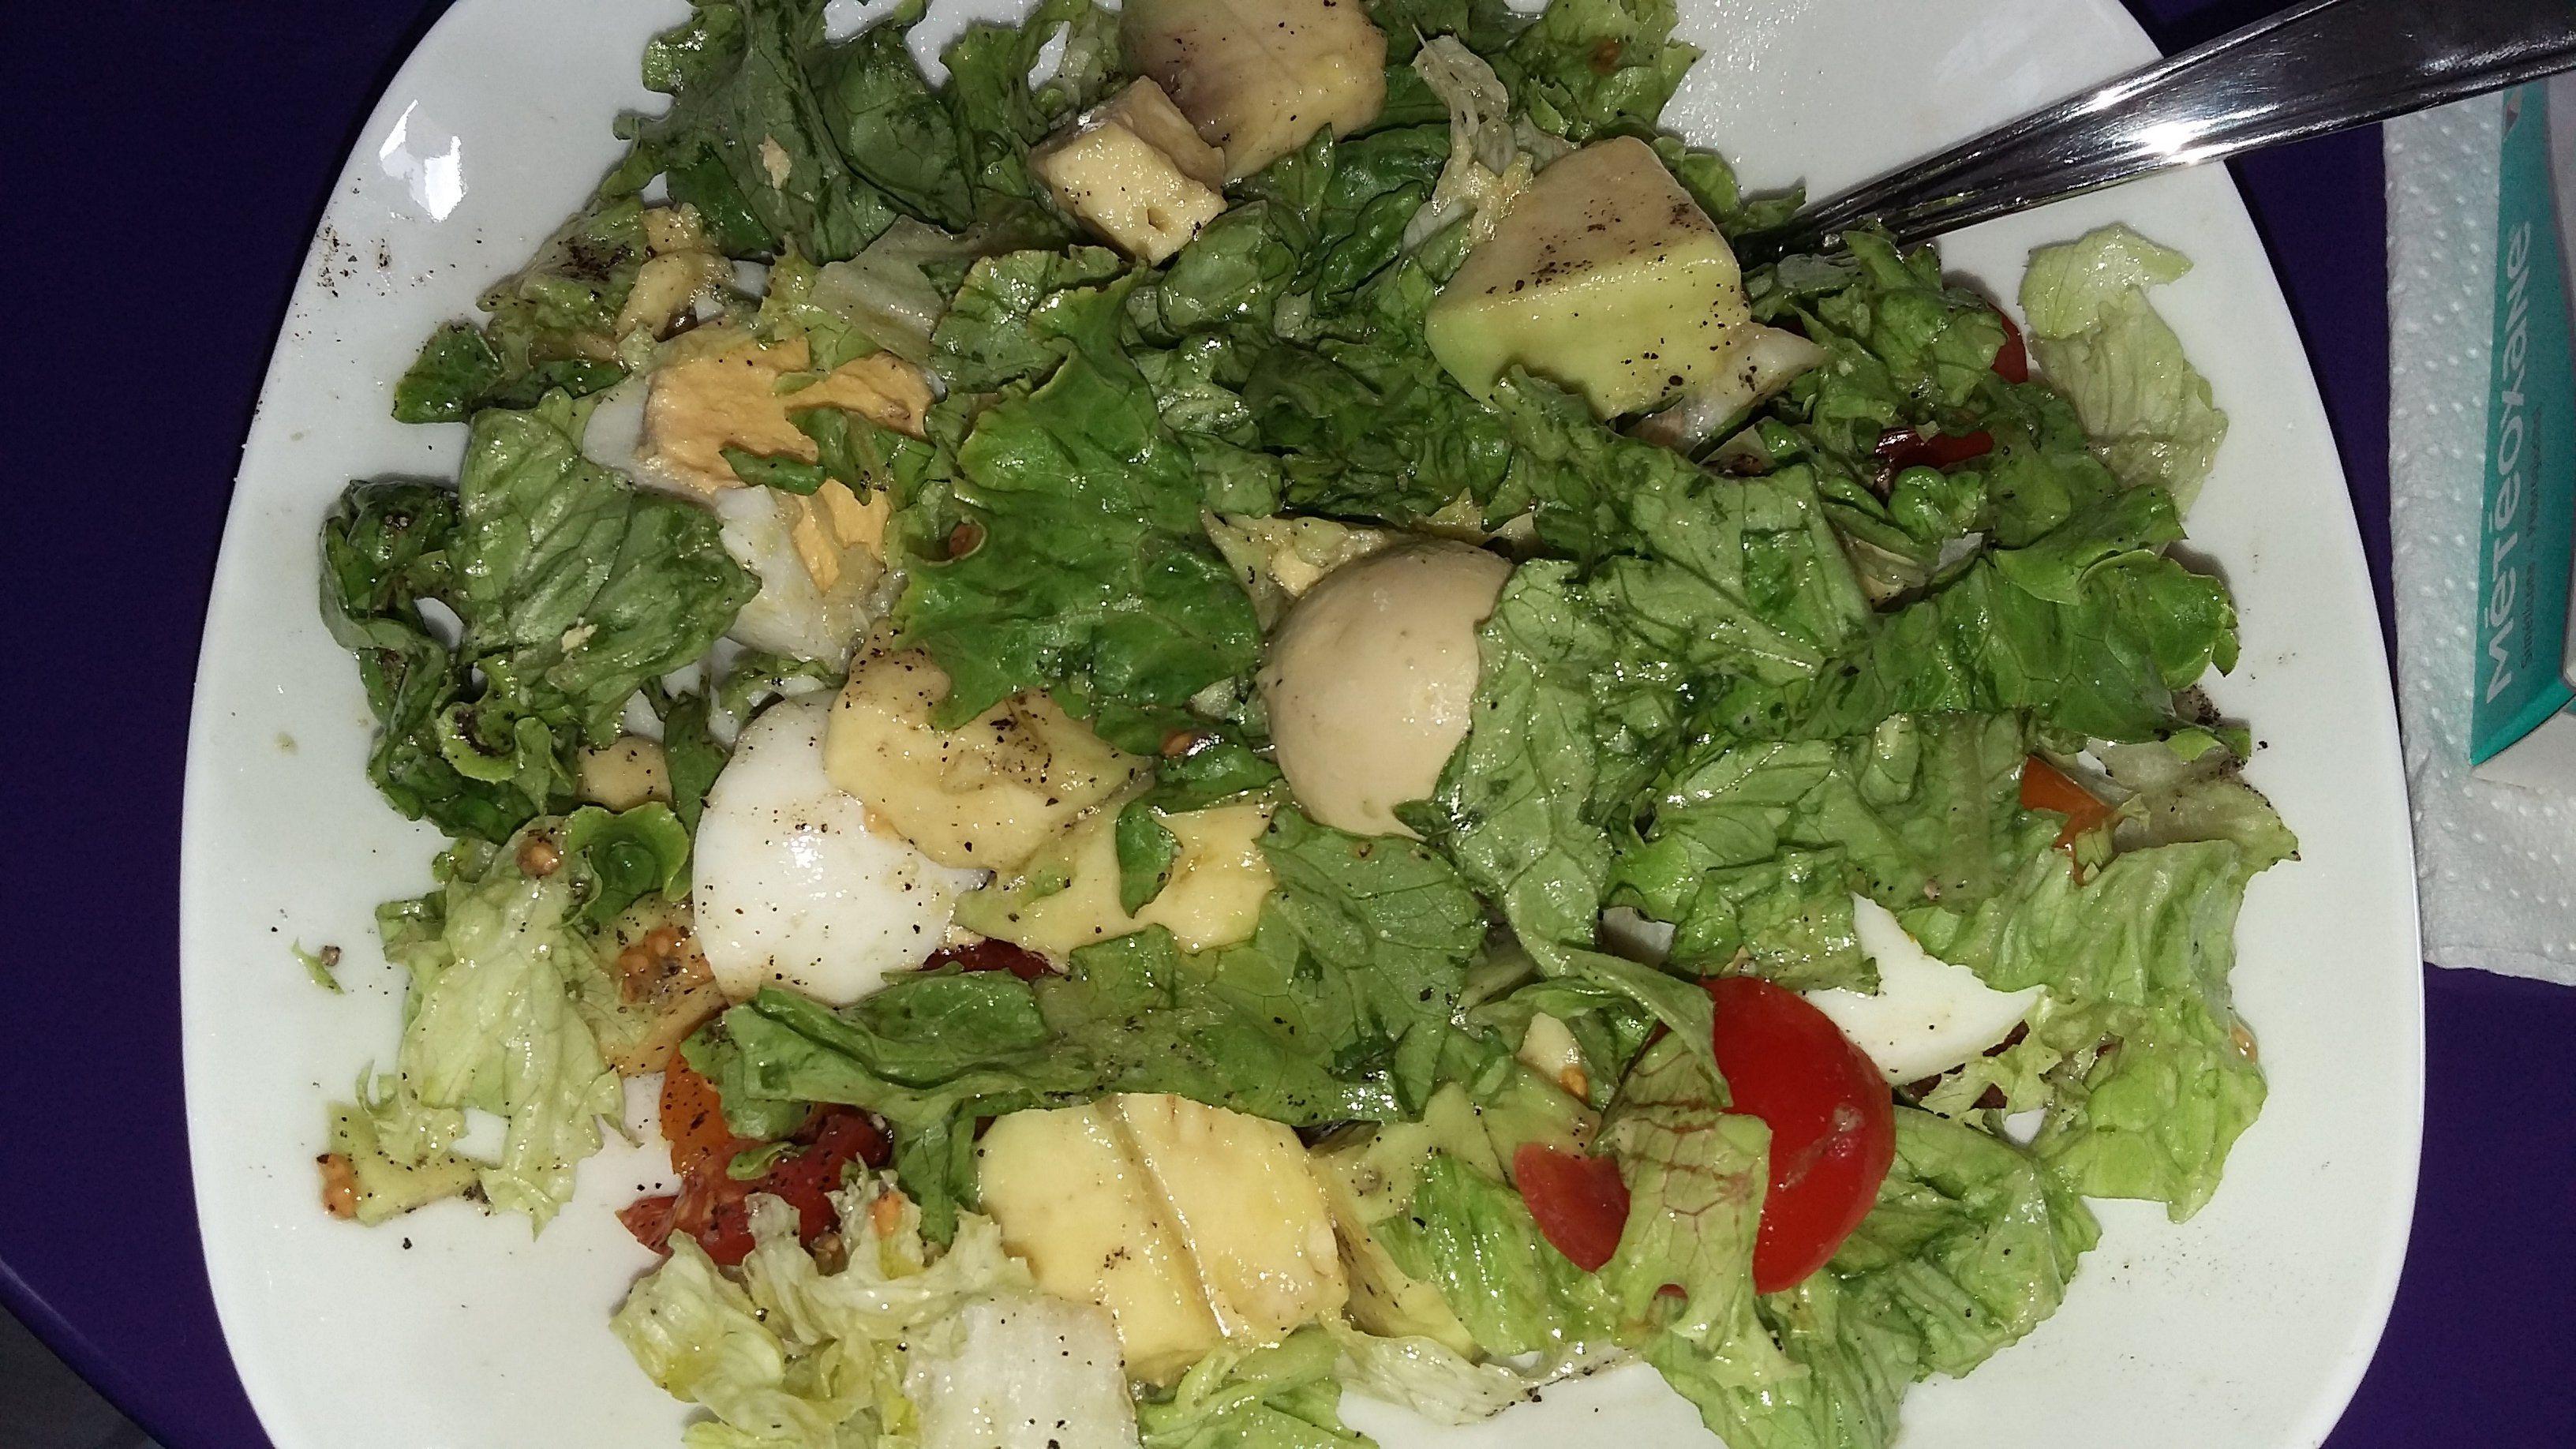 salade composée ( salade verte, tomate cerise, avocat, oeufs durs